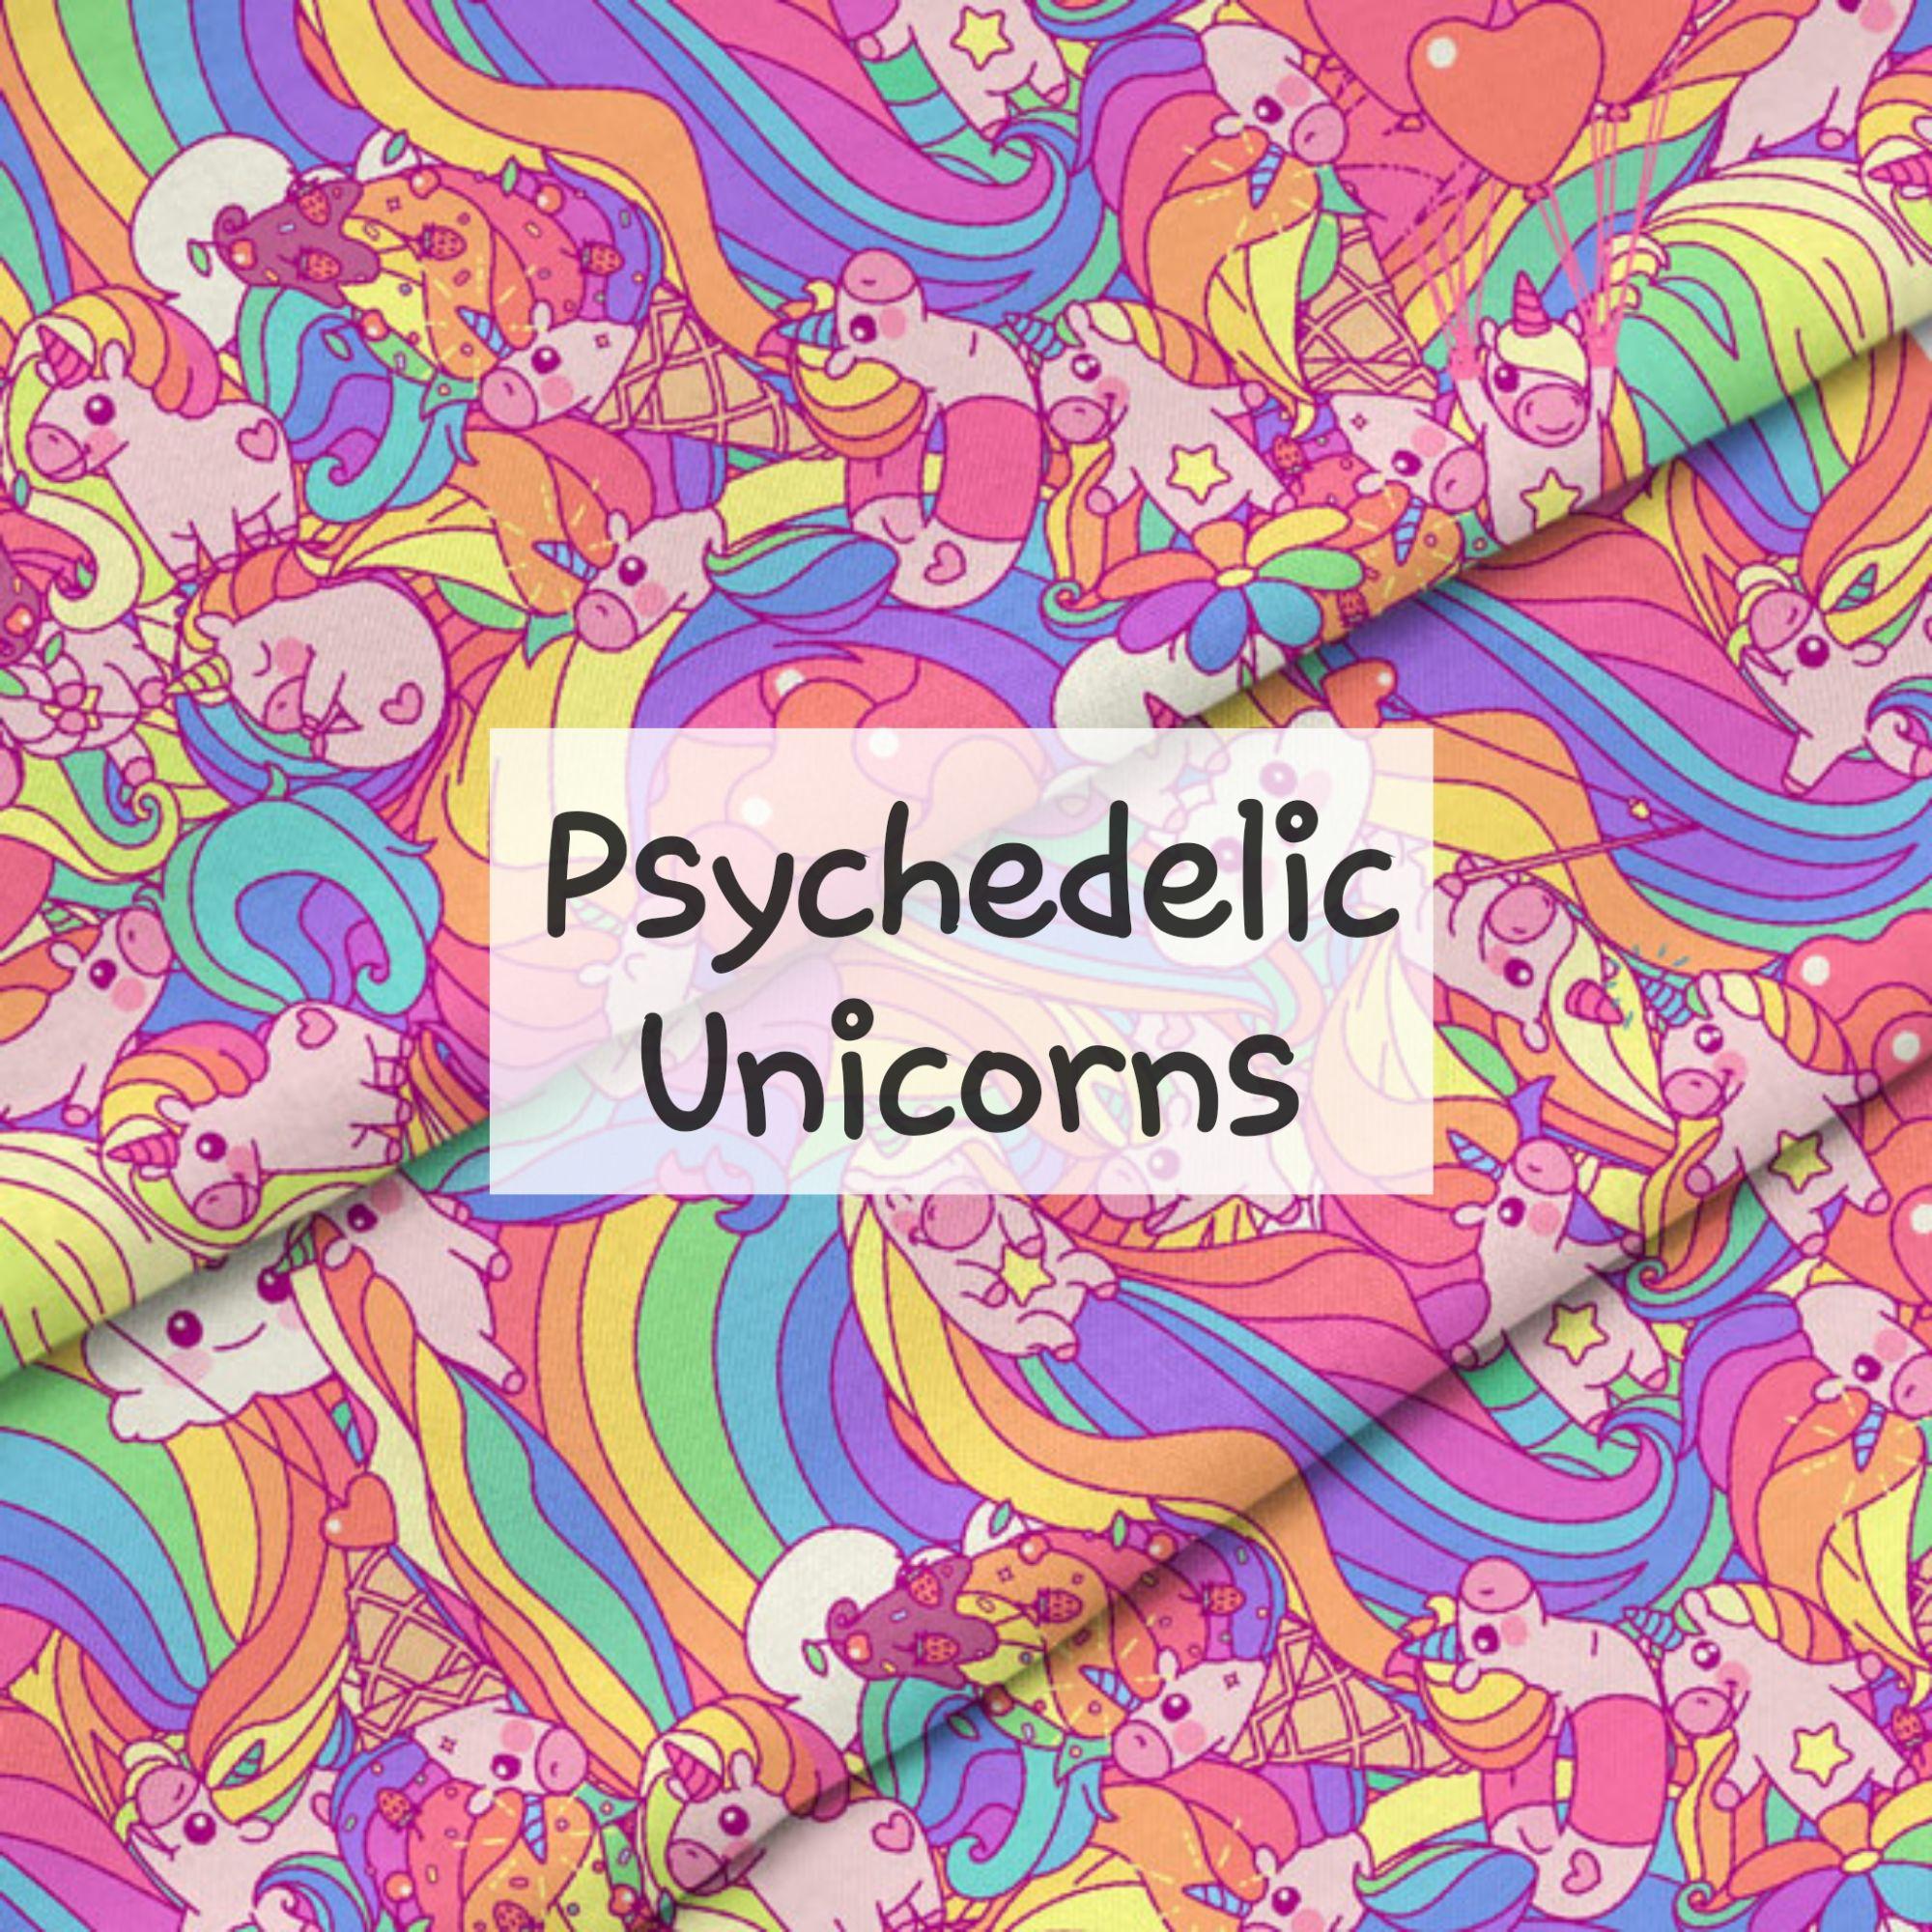 Psychedelic Unicorns